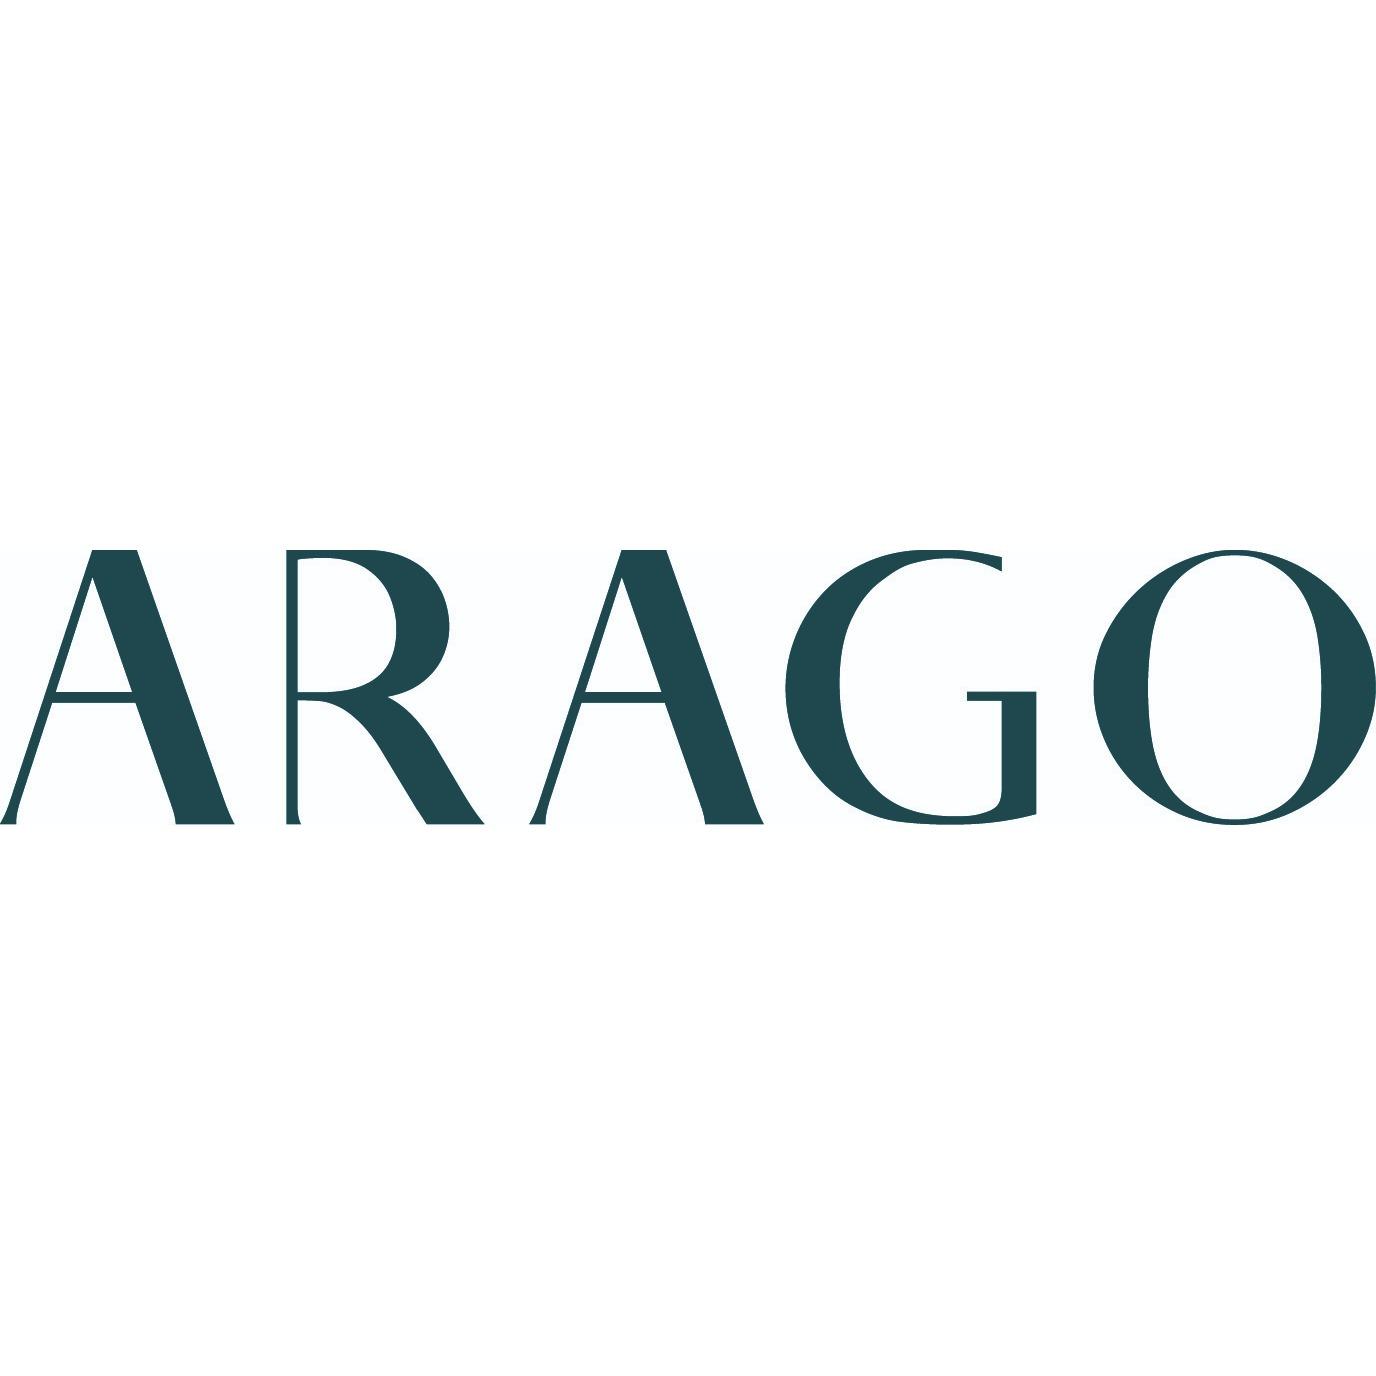 the Arago logo.